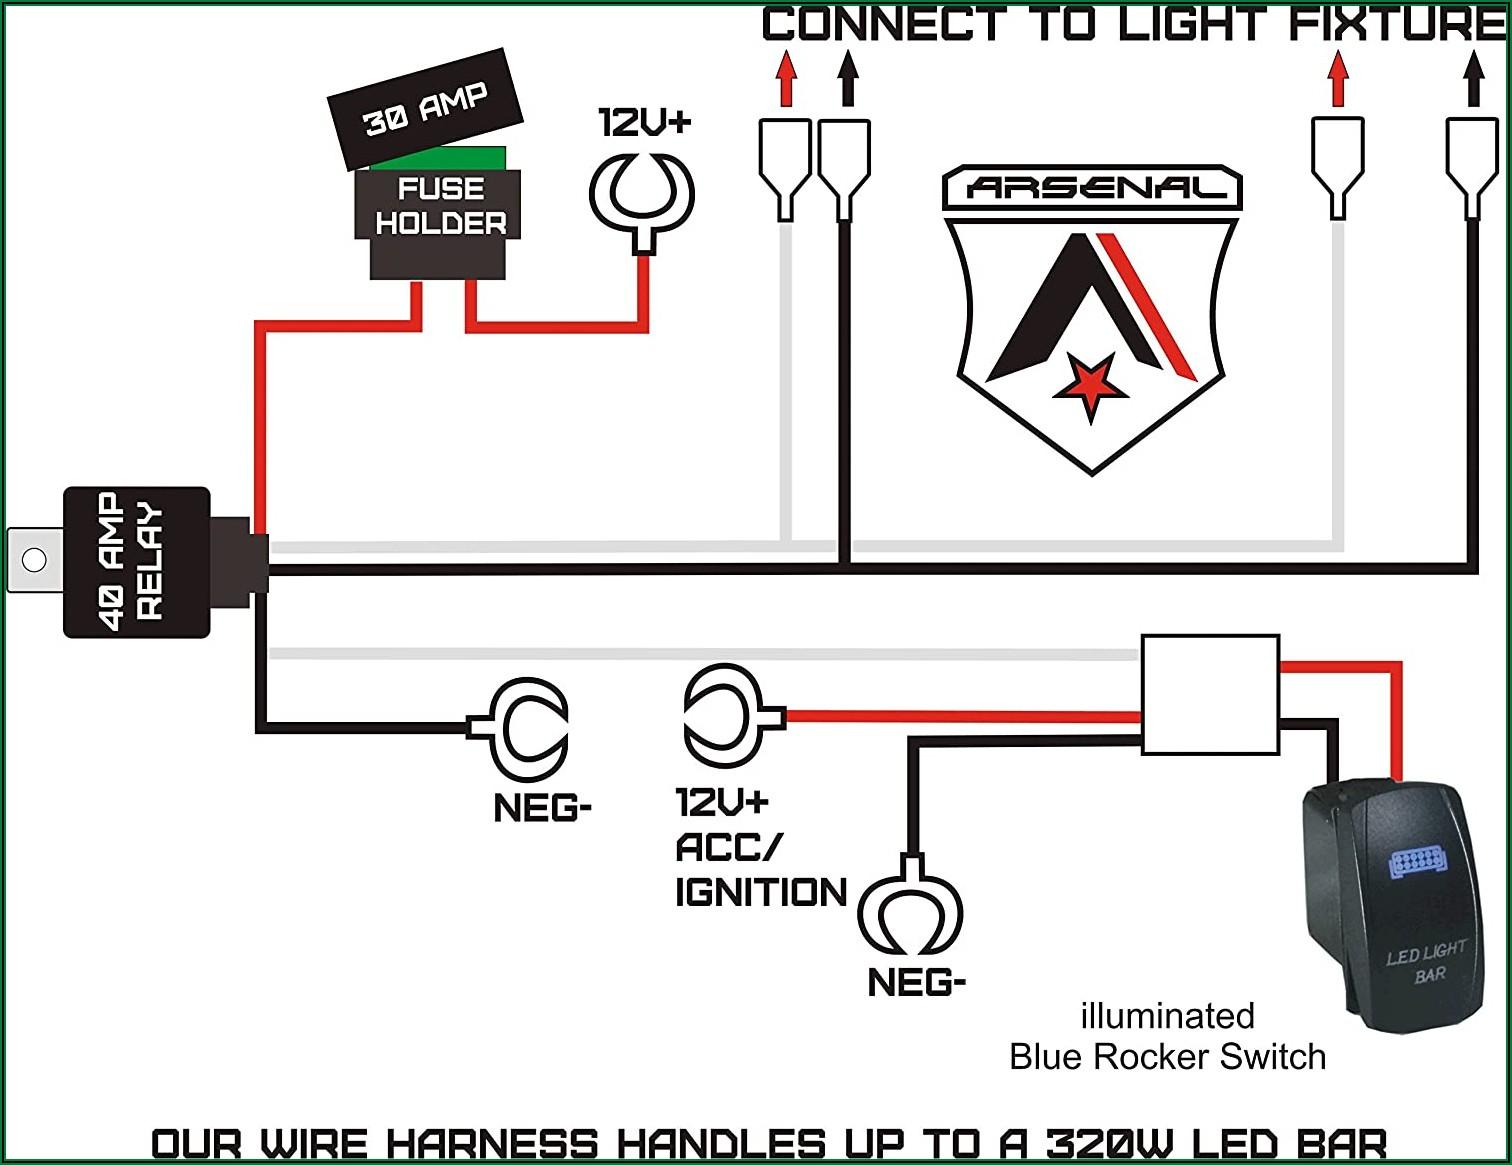 12v 40 Amp Relay Wiring Diagram